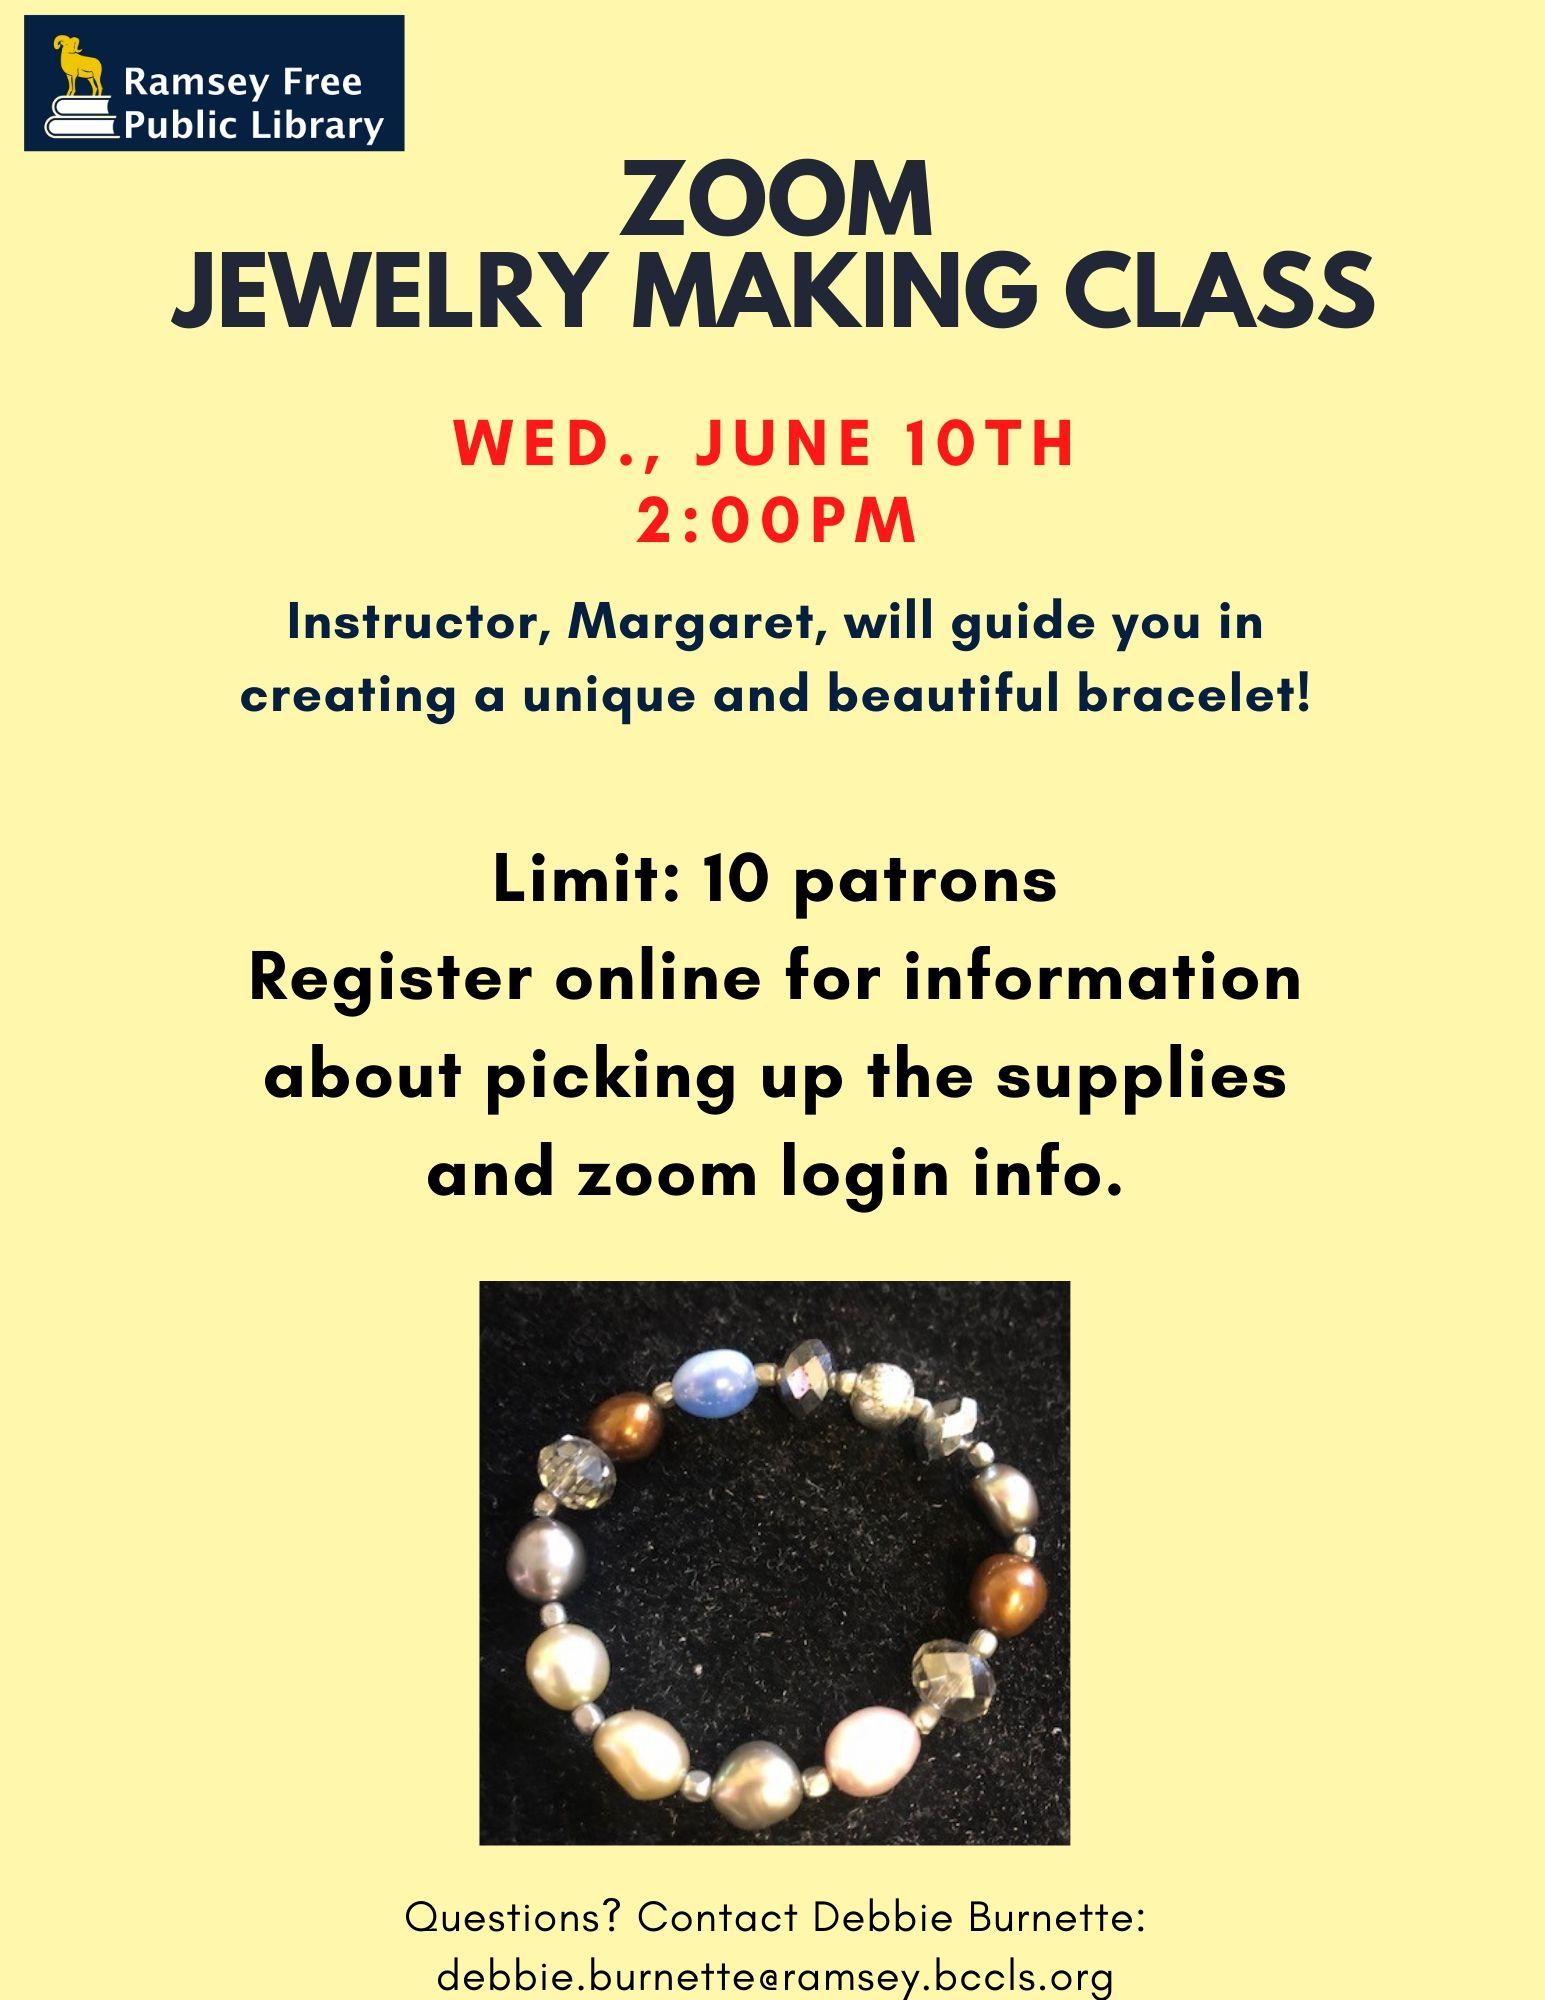 Zoom Jewelry Making Class